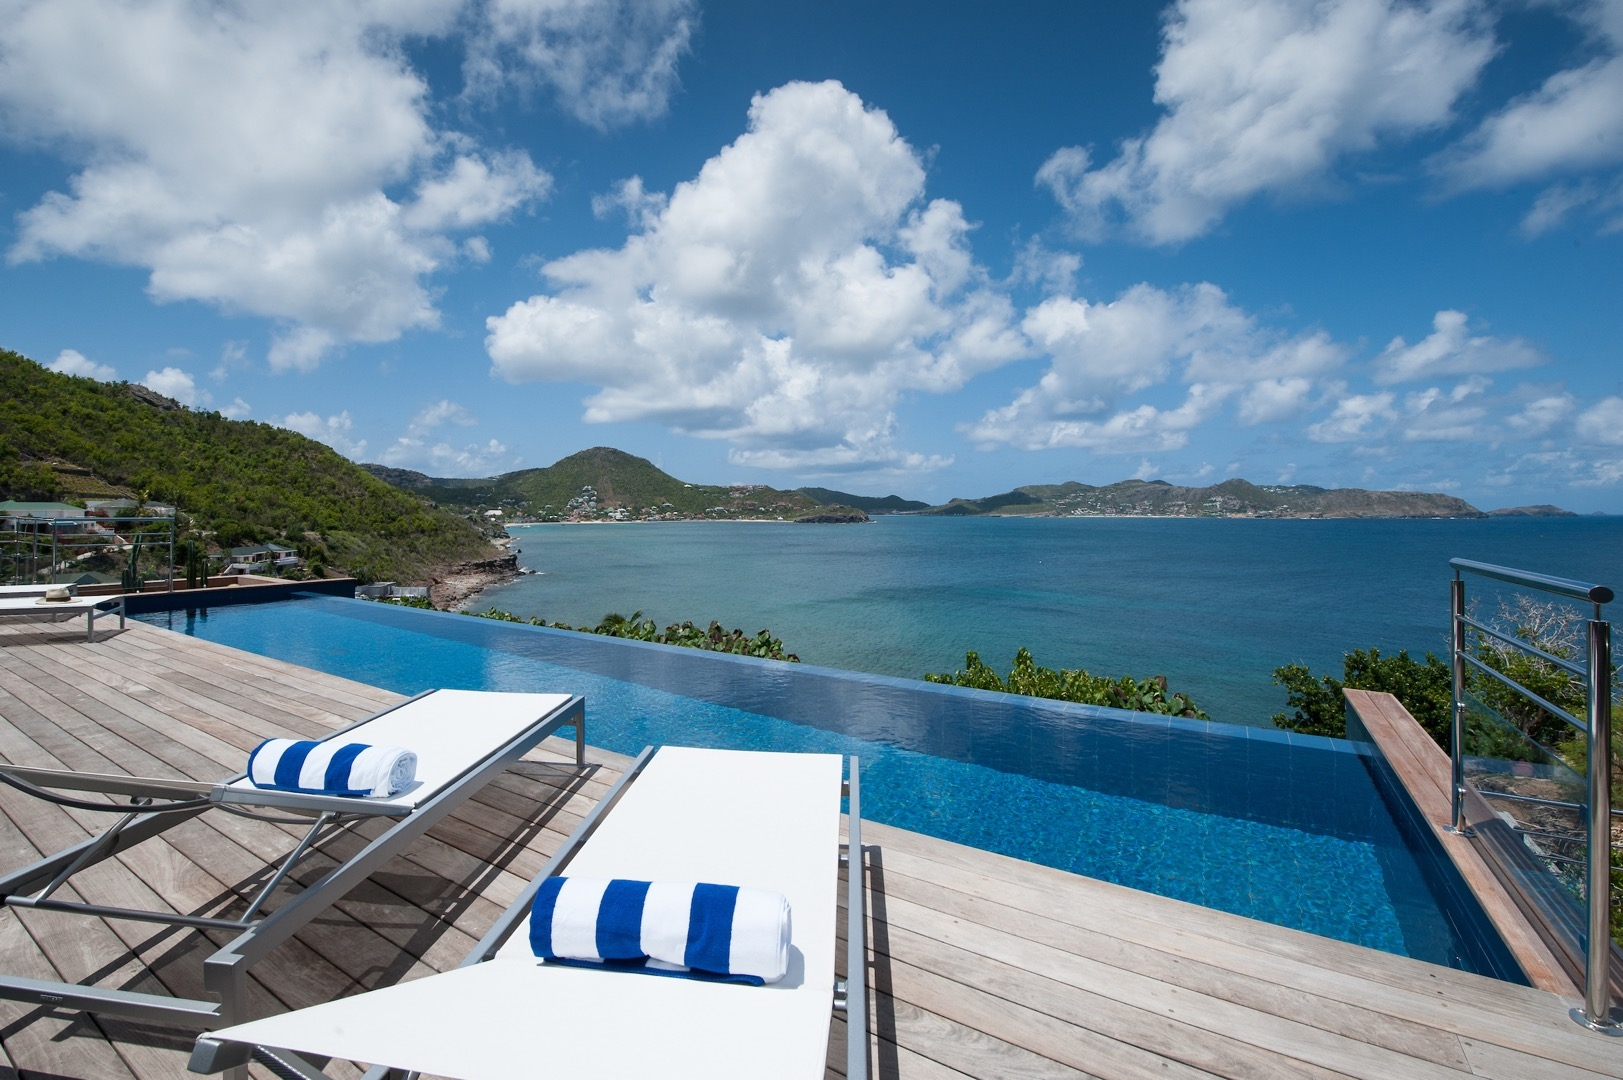 Luxury villa rentals caribbean - St barthelemy - Pointe milou - No location 4 - Pointe Milou - Image 1/20